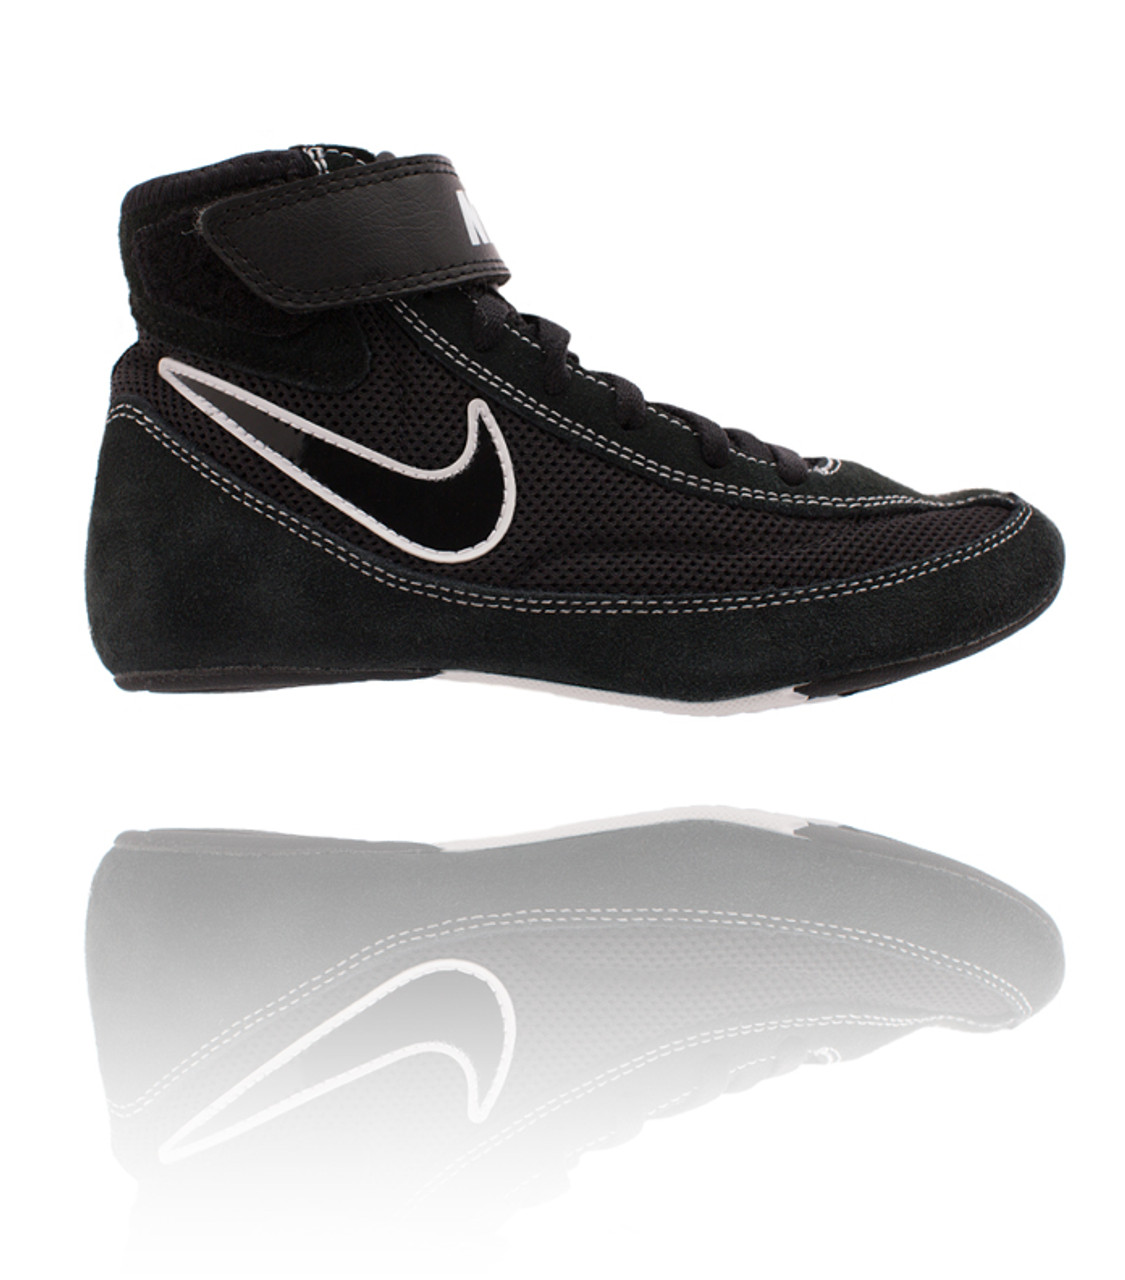 Nike Speedsweep VII - Black / Black / White